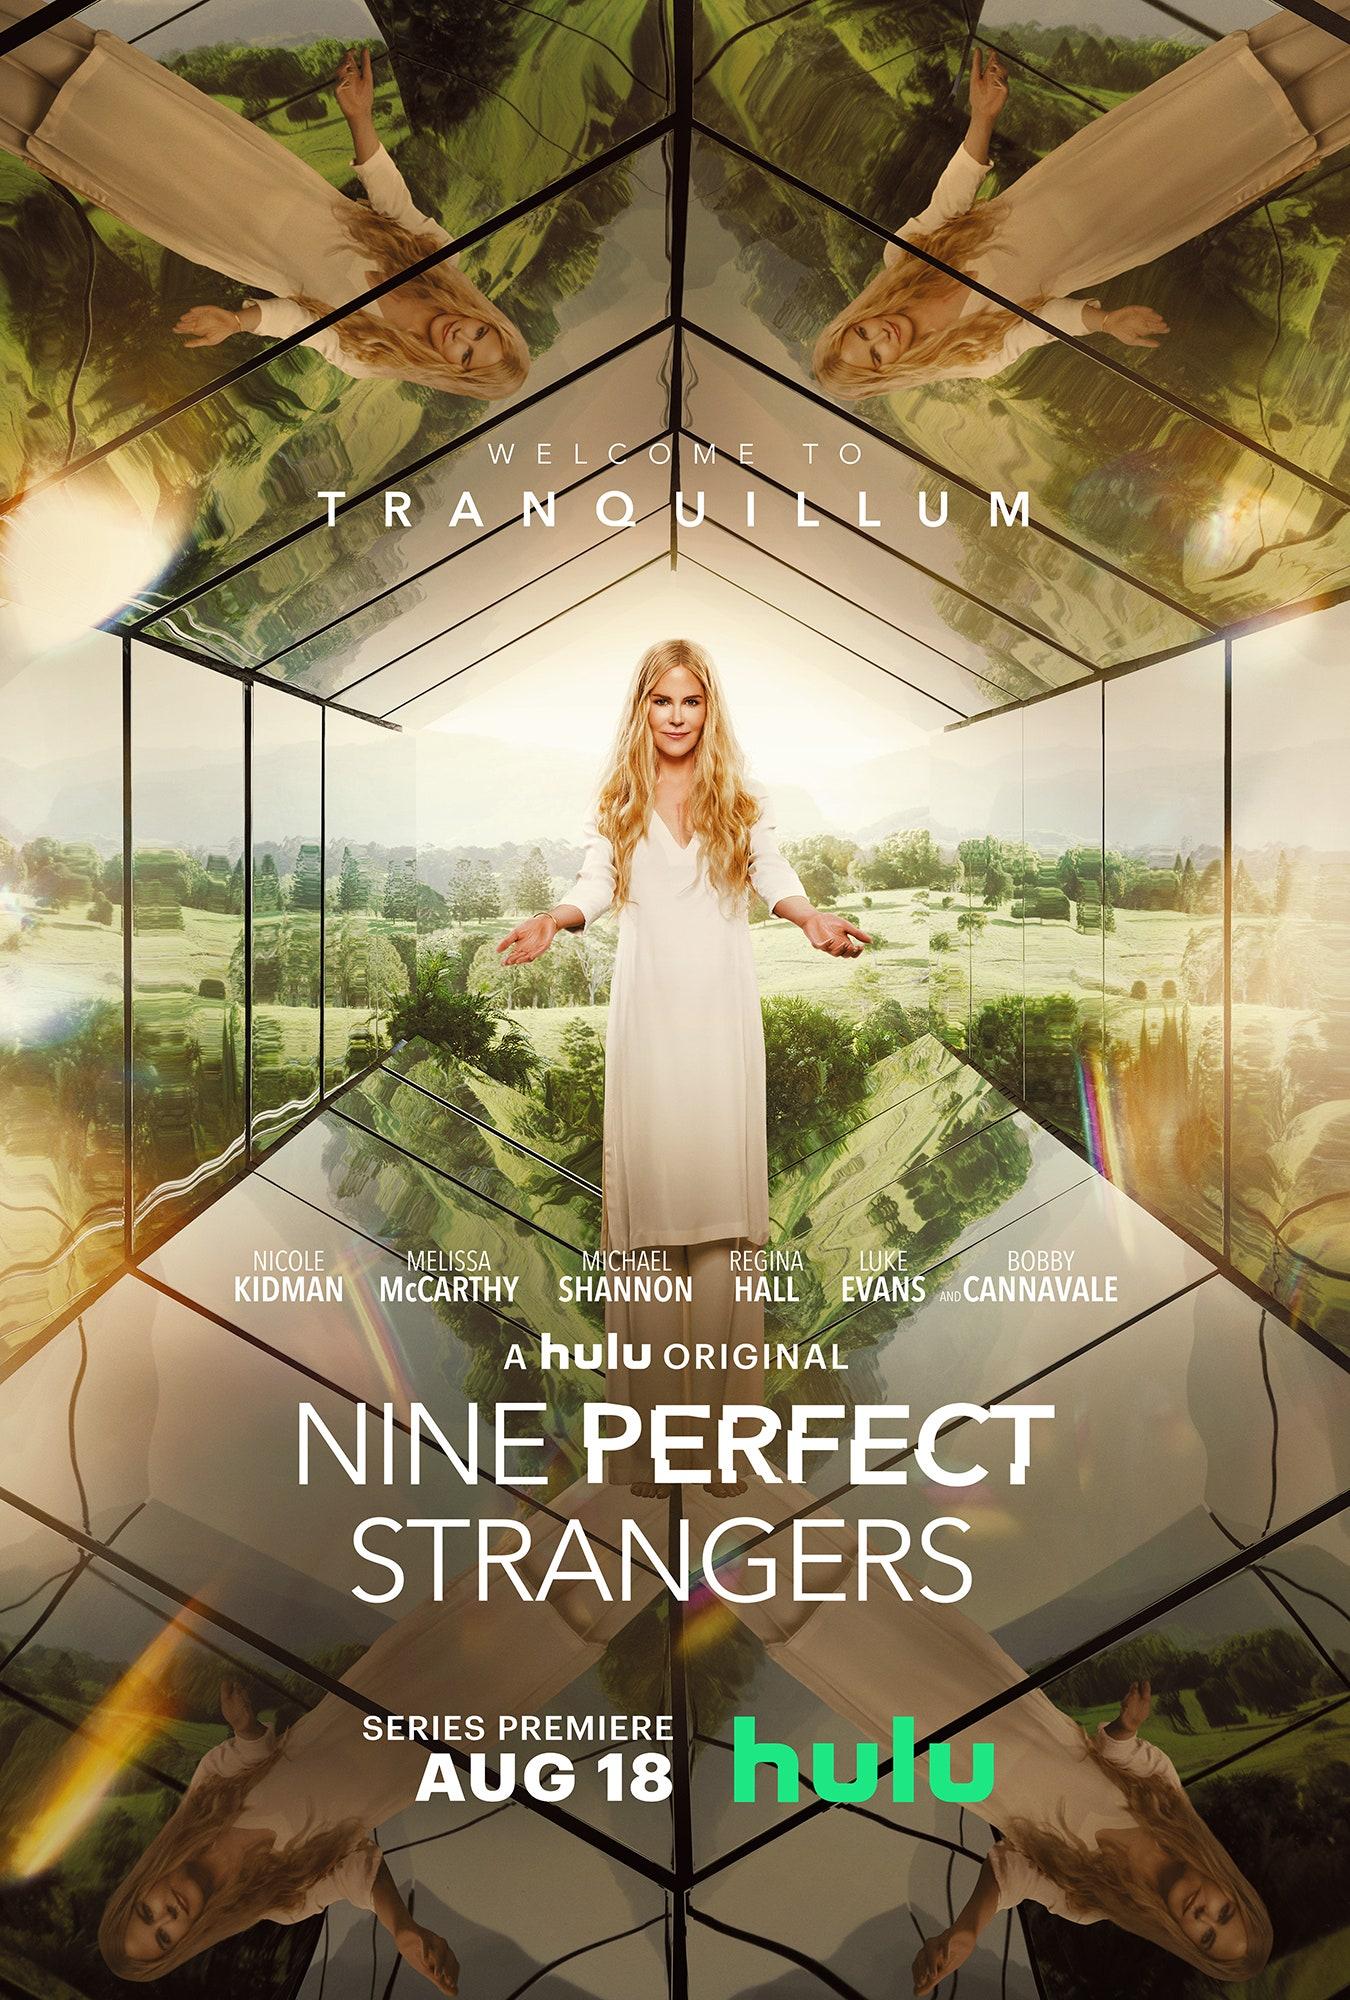 Nine Perfect Strangers serial nicole kidman